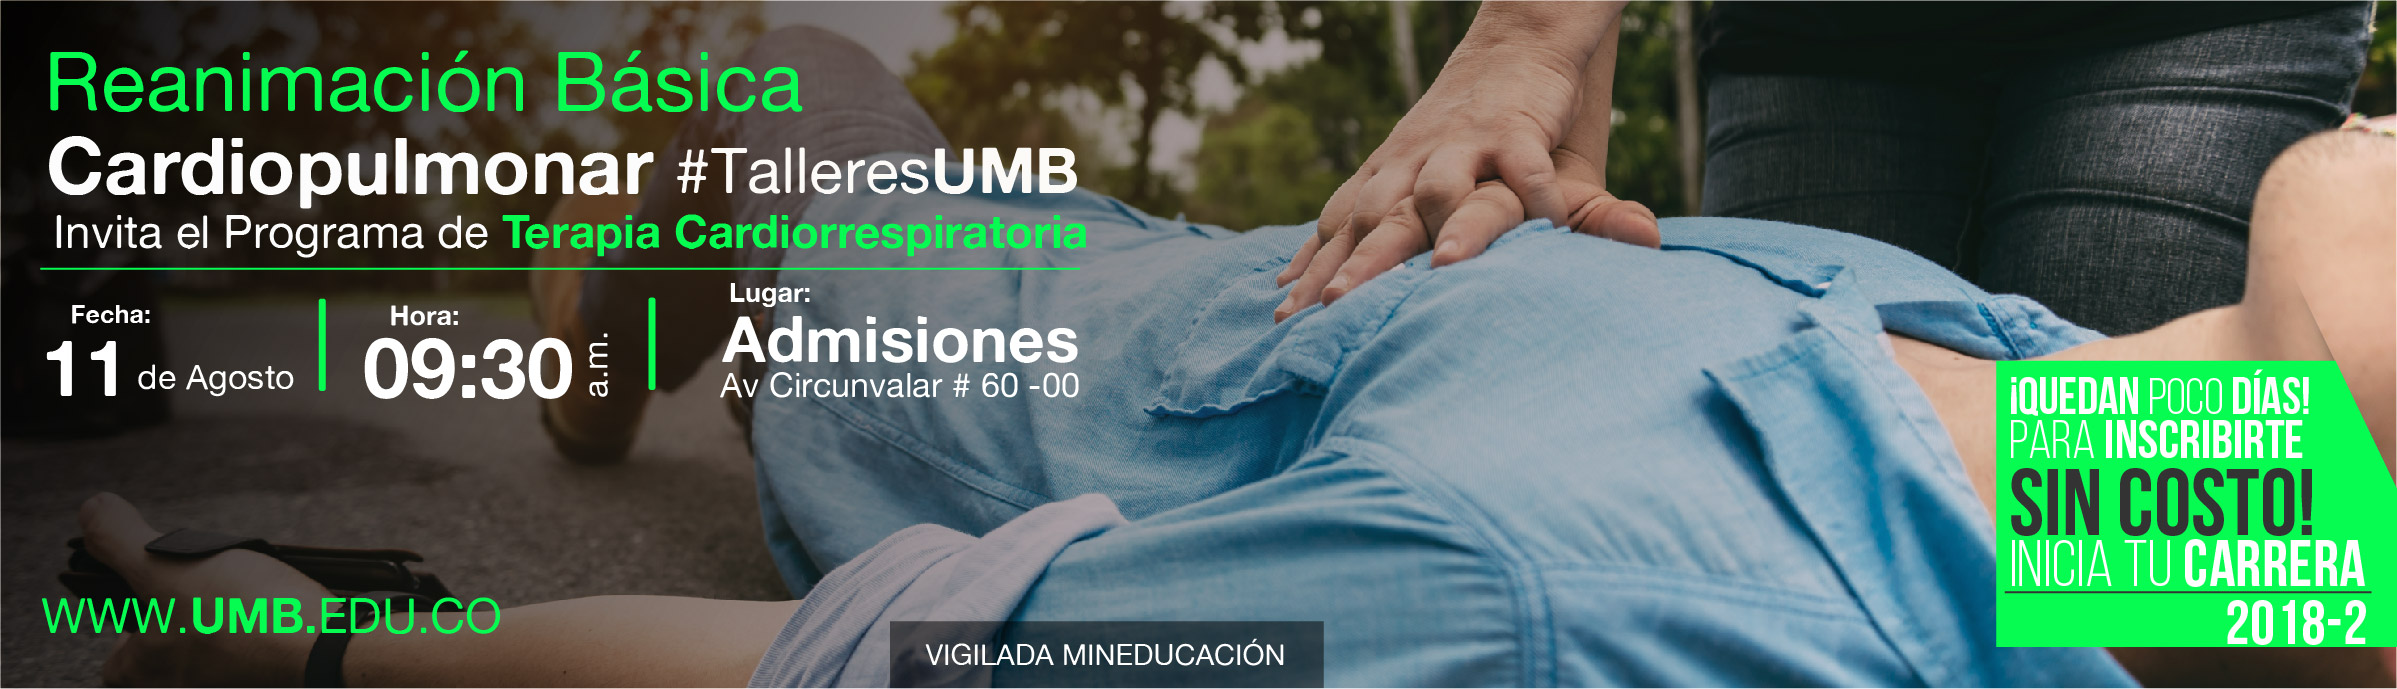 Reanimacion-cardiopulmo-banner